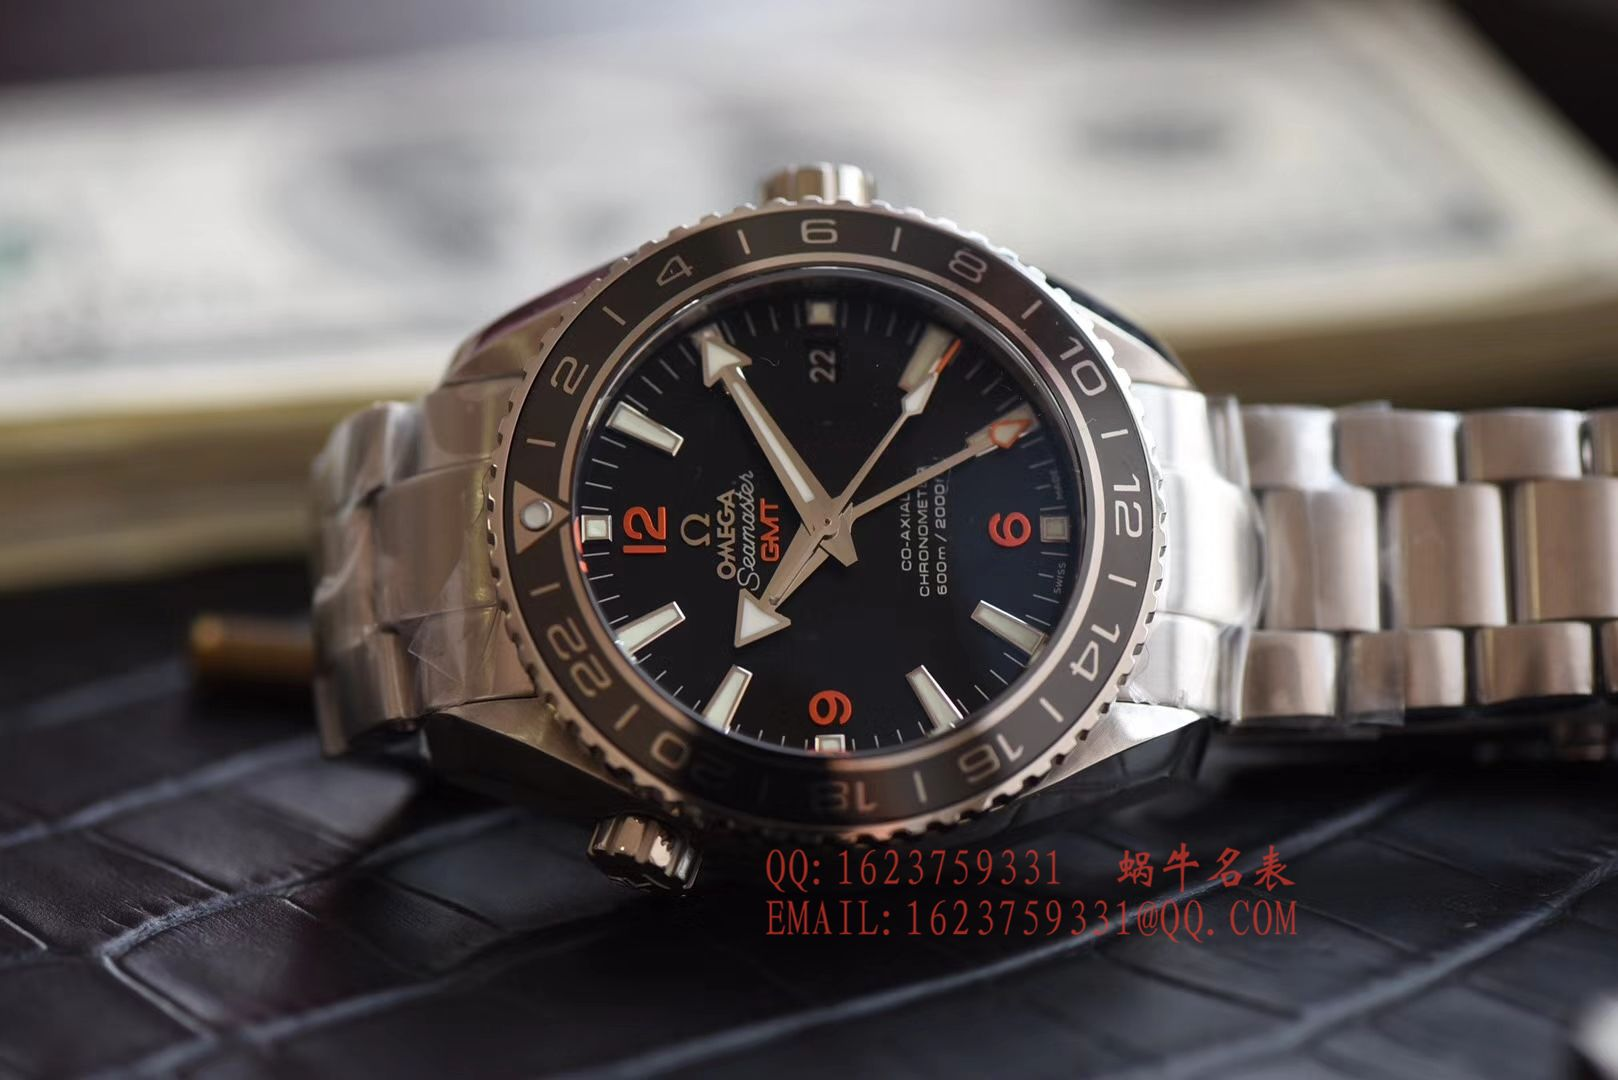 【KW一比一超A高精仿手表】欧米茄海马海洋宇宙600米腕表系列232.30.44.22.01.002GMT腕表